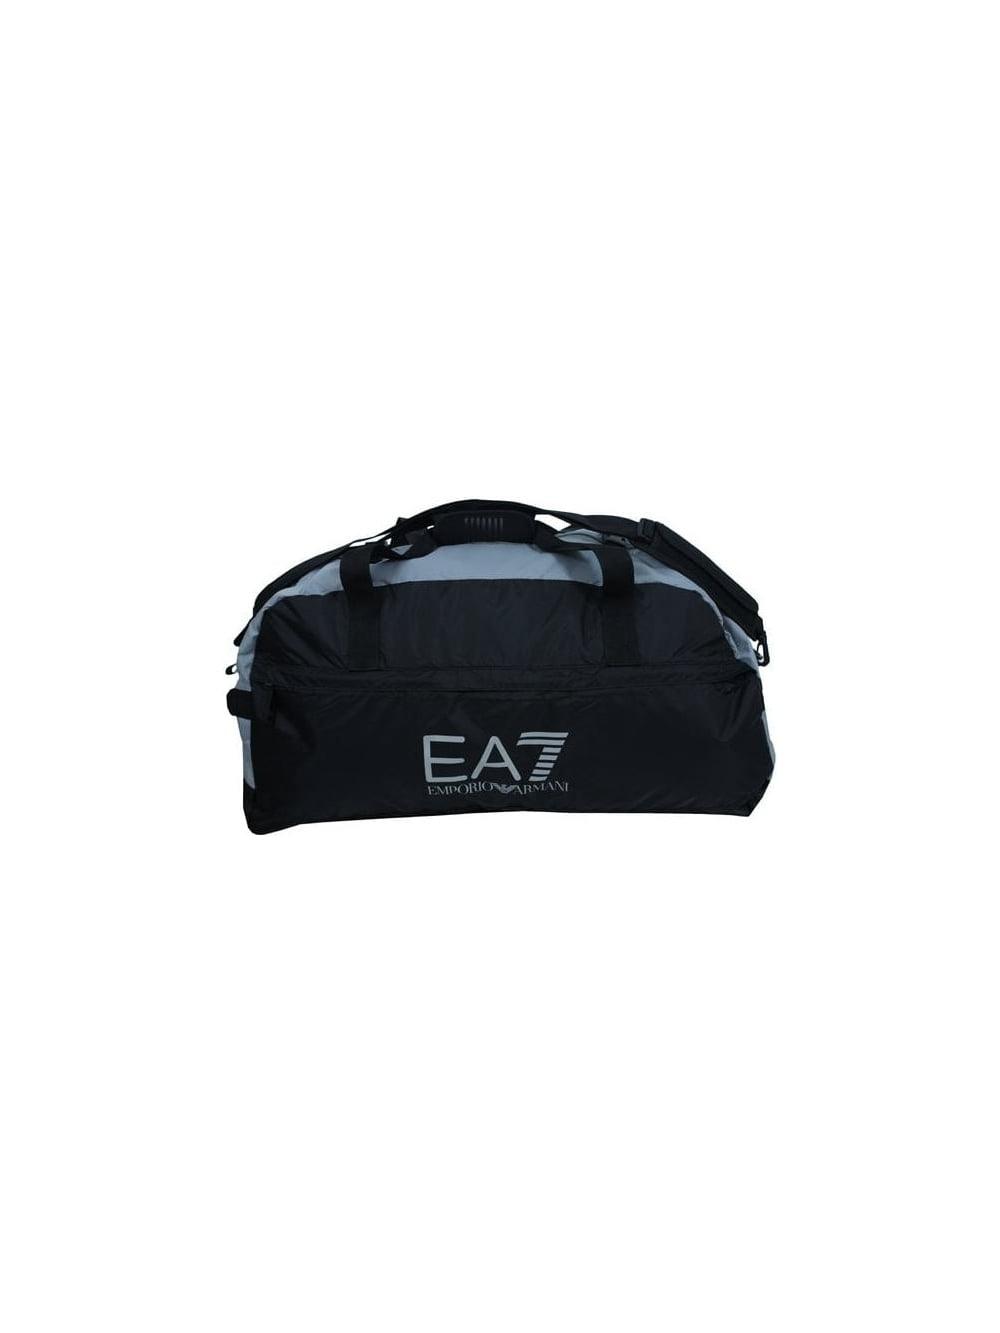 dc2602ff9aea EA7 Big Logo Large Duffle Bag in Black - Northern Threads